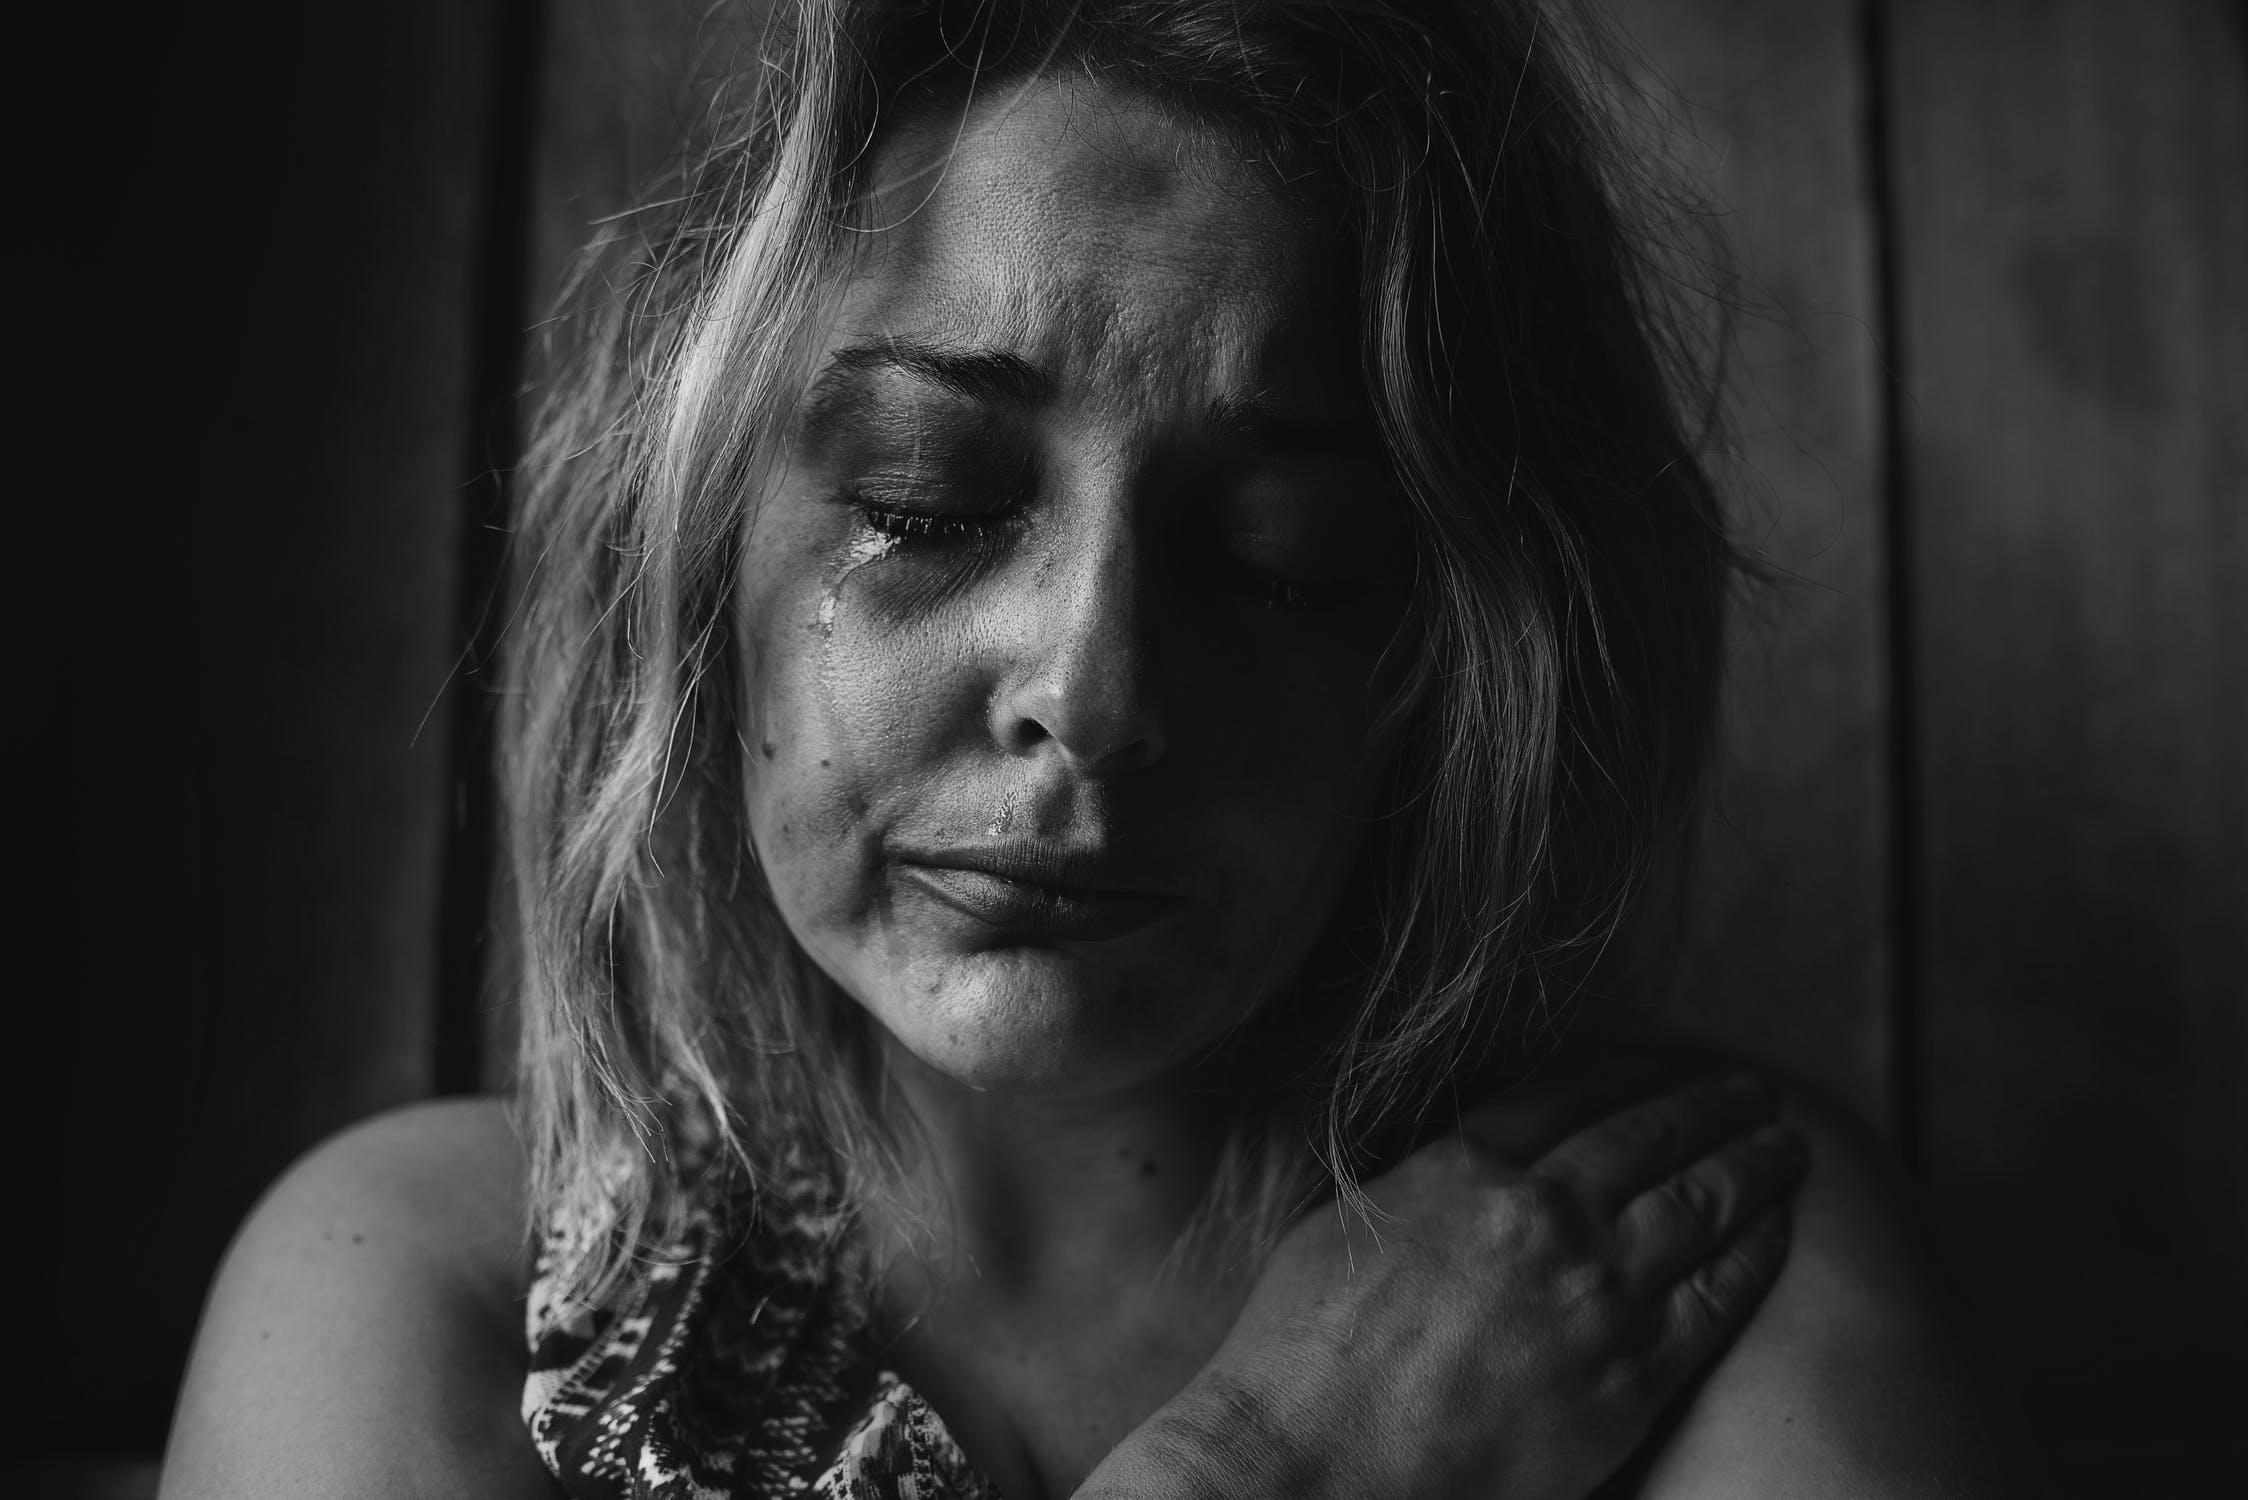 Mujer angustiada llorando. | Imagen: Pexels